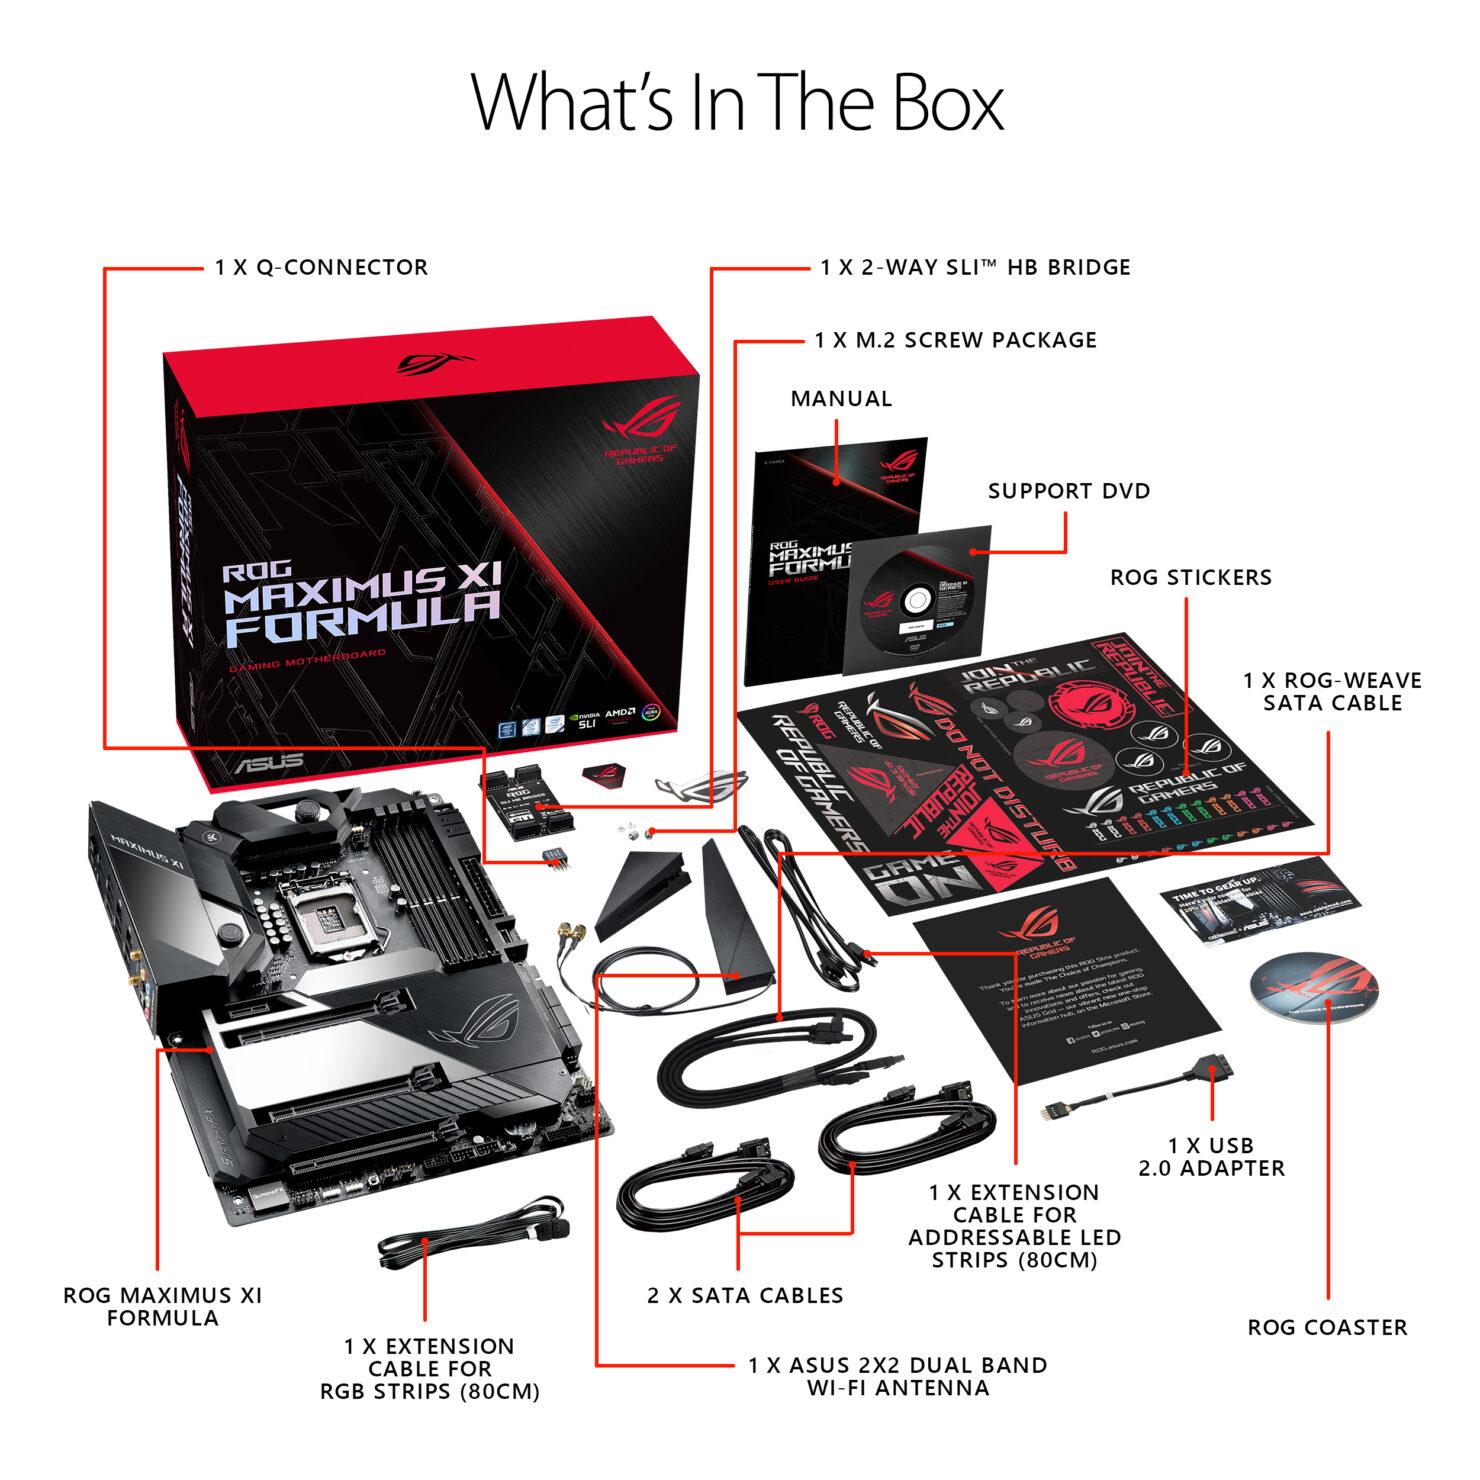 6-rog-maximus-xi-formula-whats-in-the-box